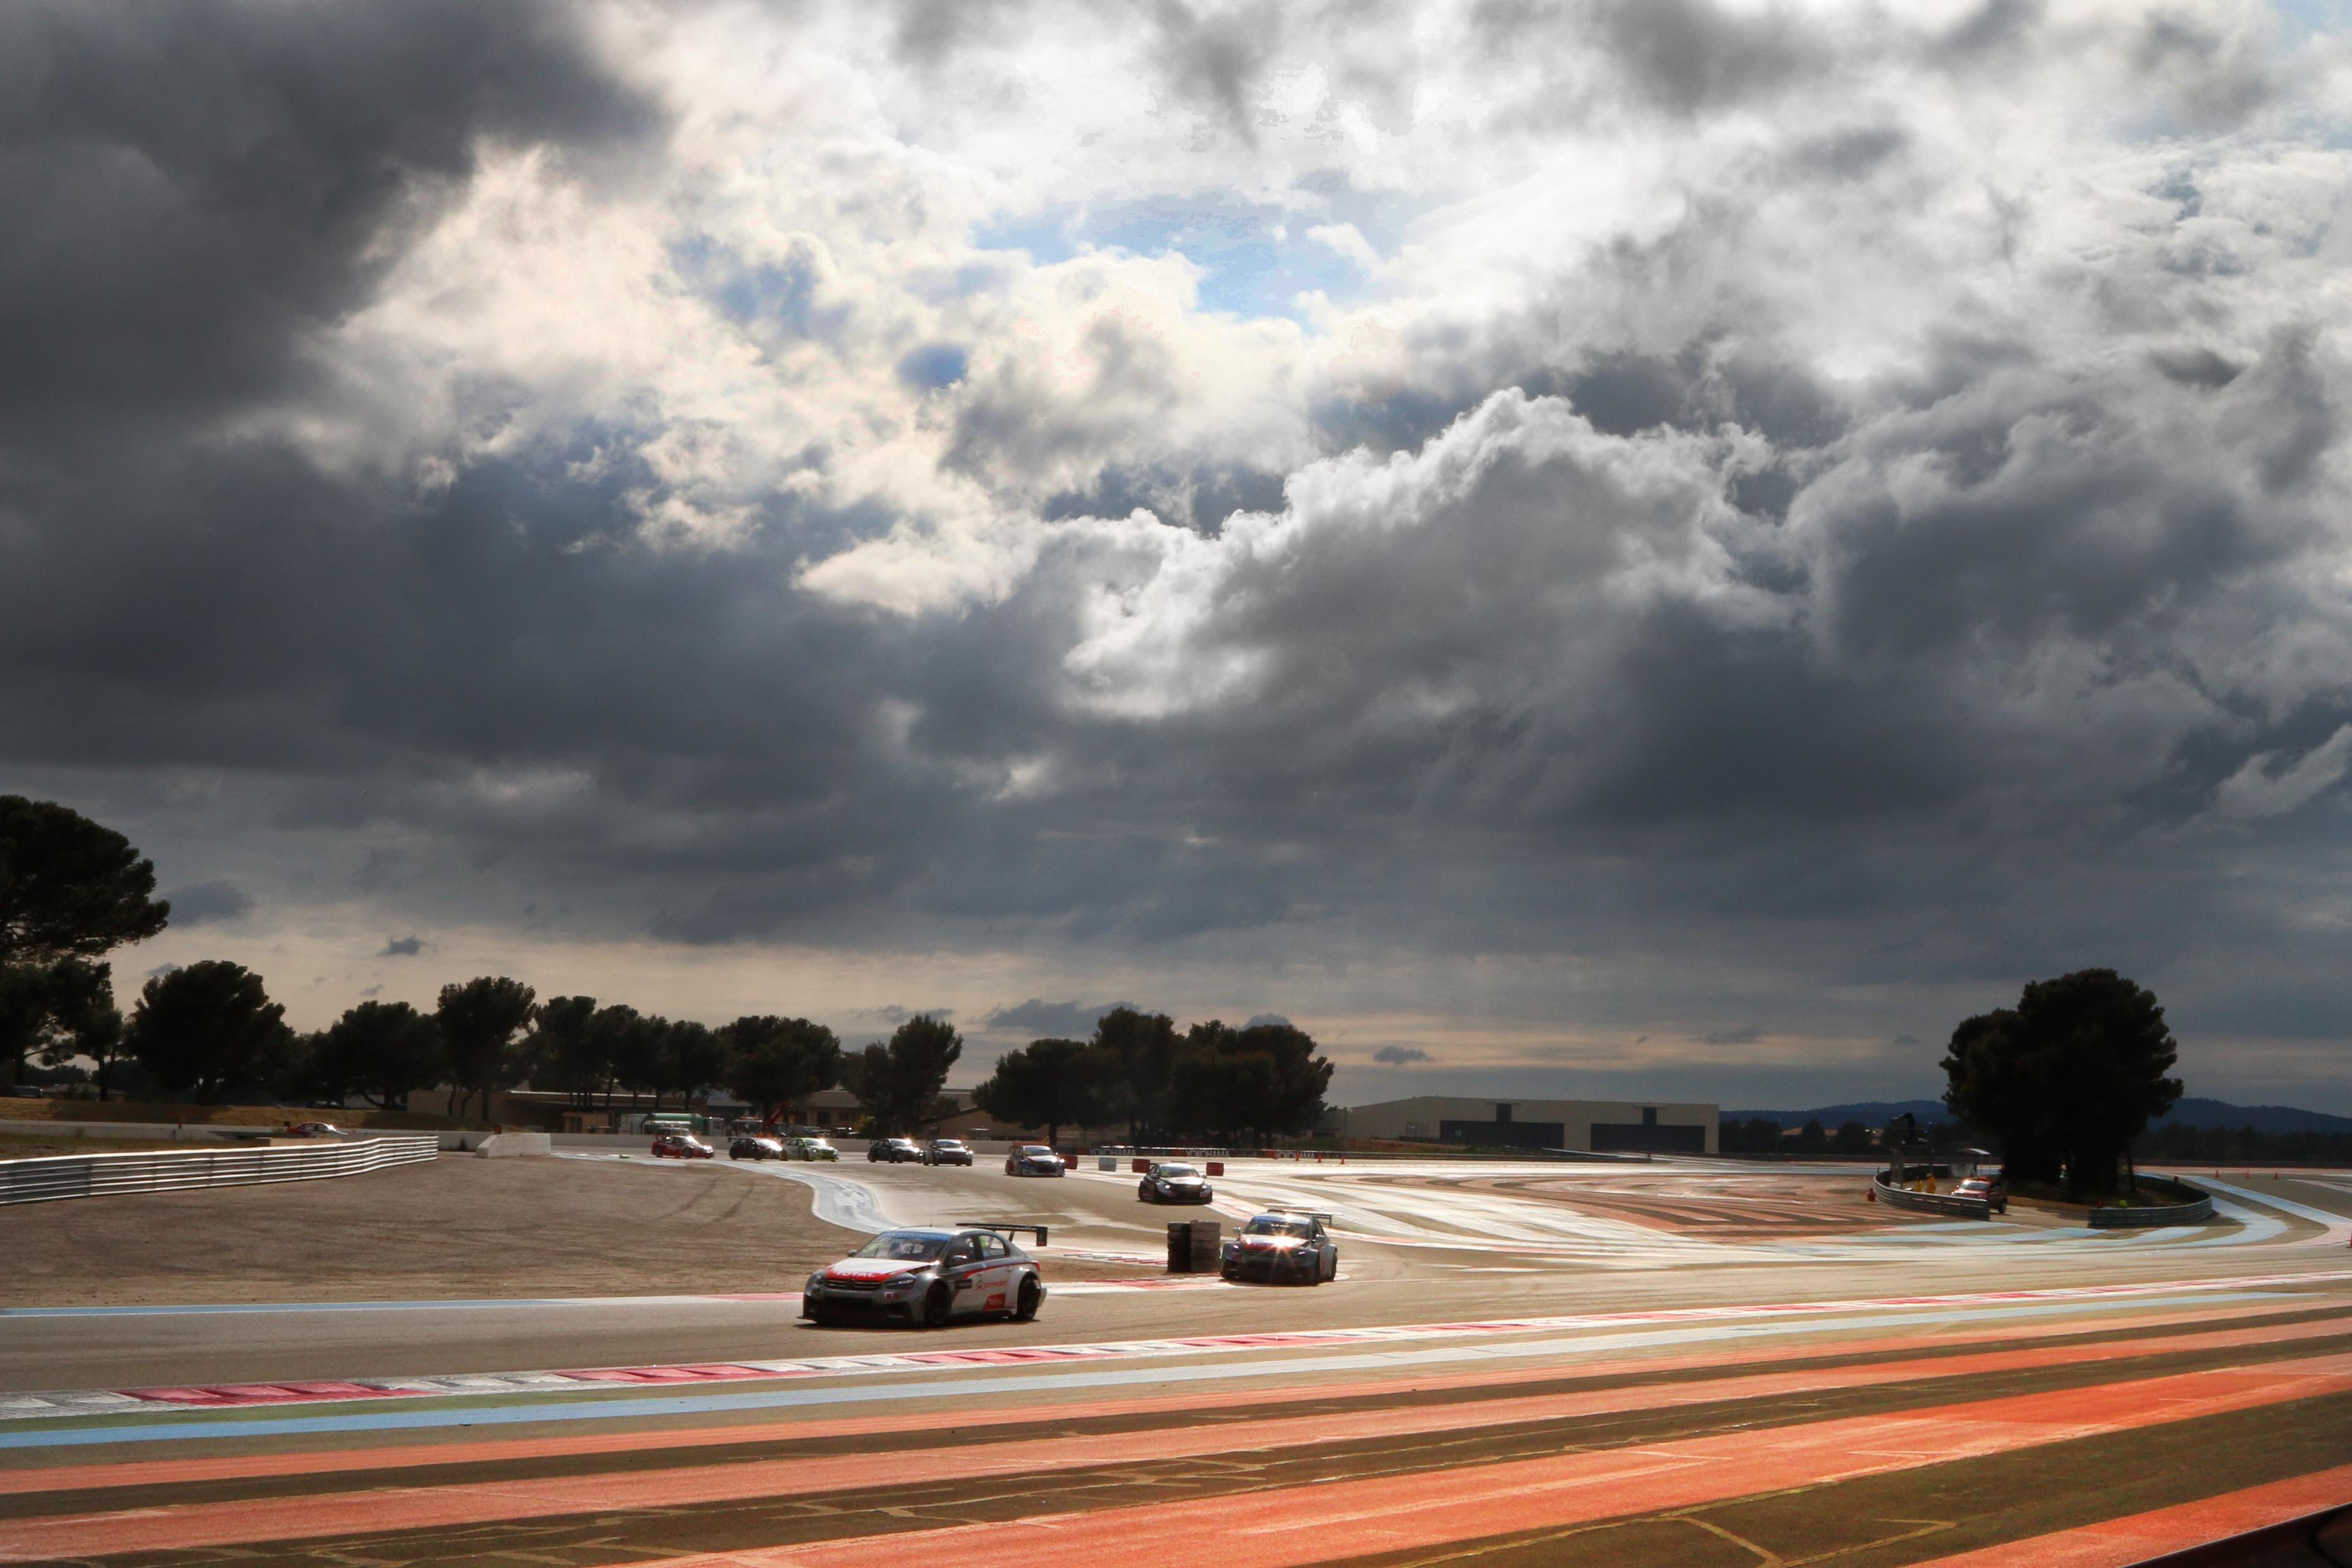 FIA WORLD TOURING CAR CHAMPIONSHIP 2014 – PAUL RICARD